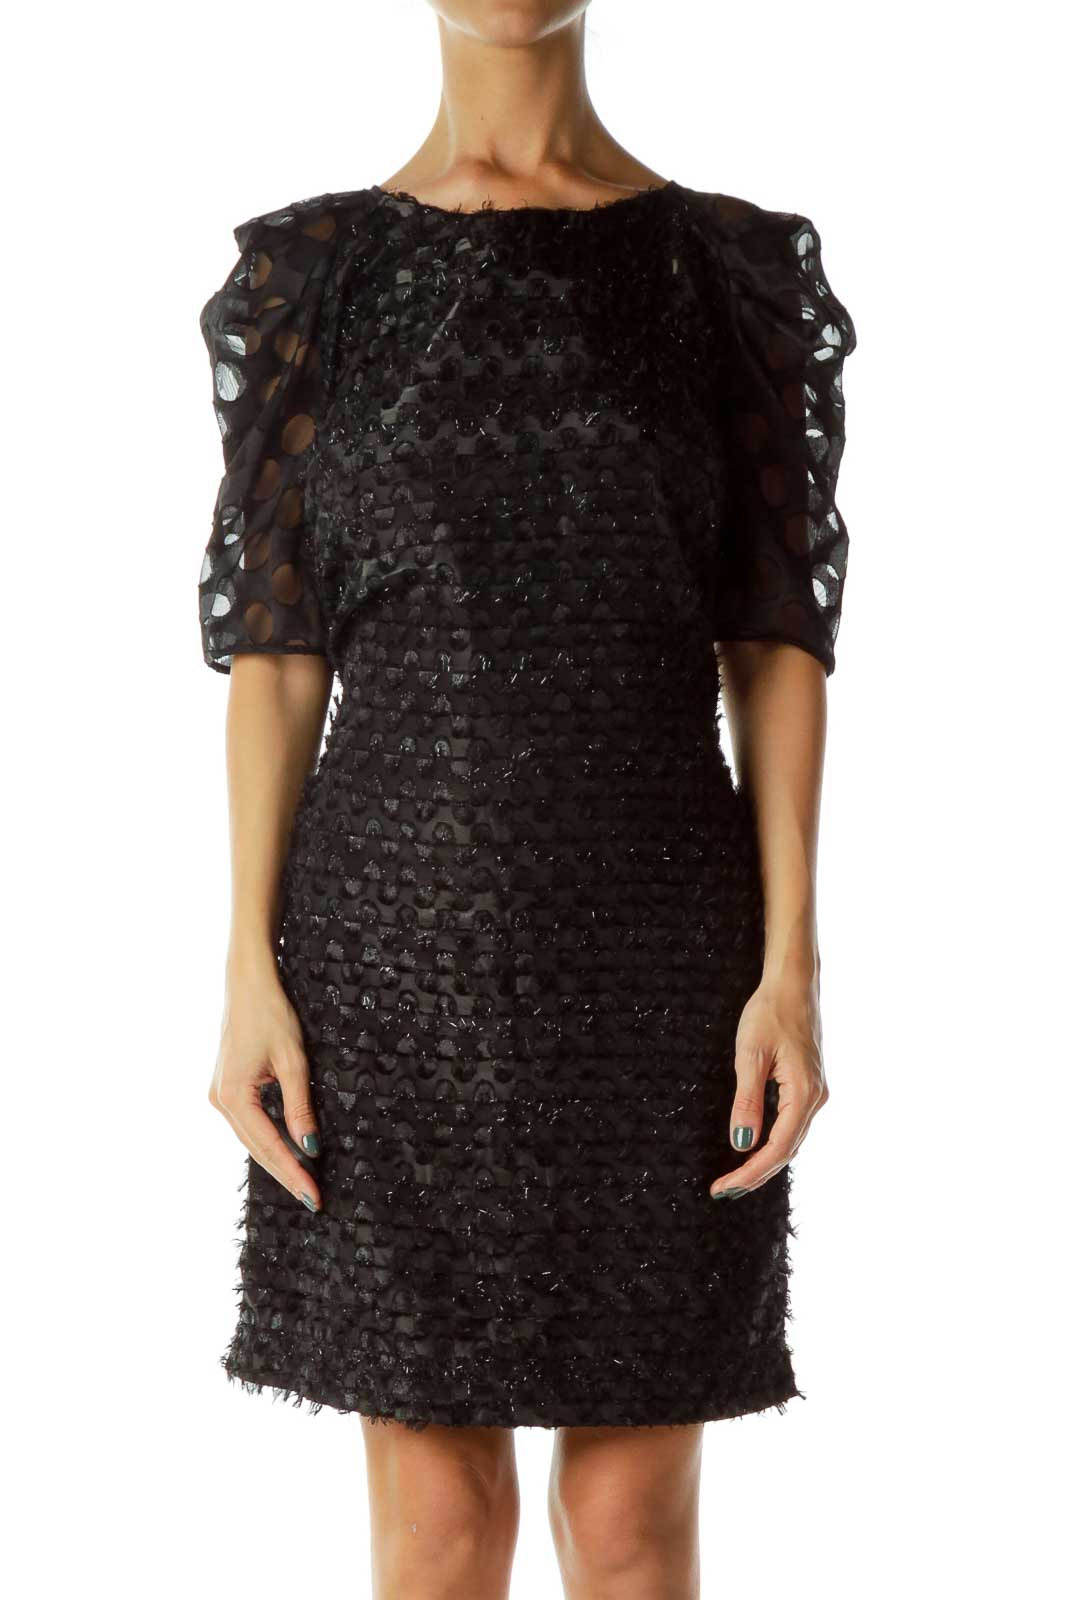 Black Sparkly Short Sleeve Dress Front